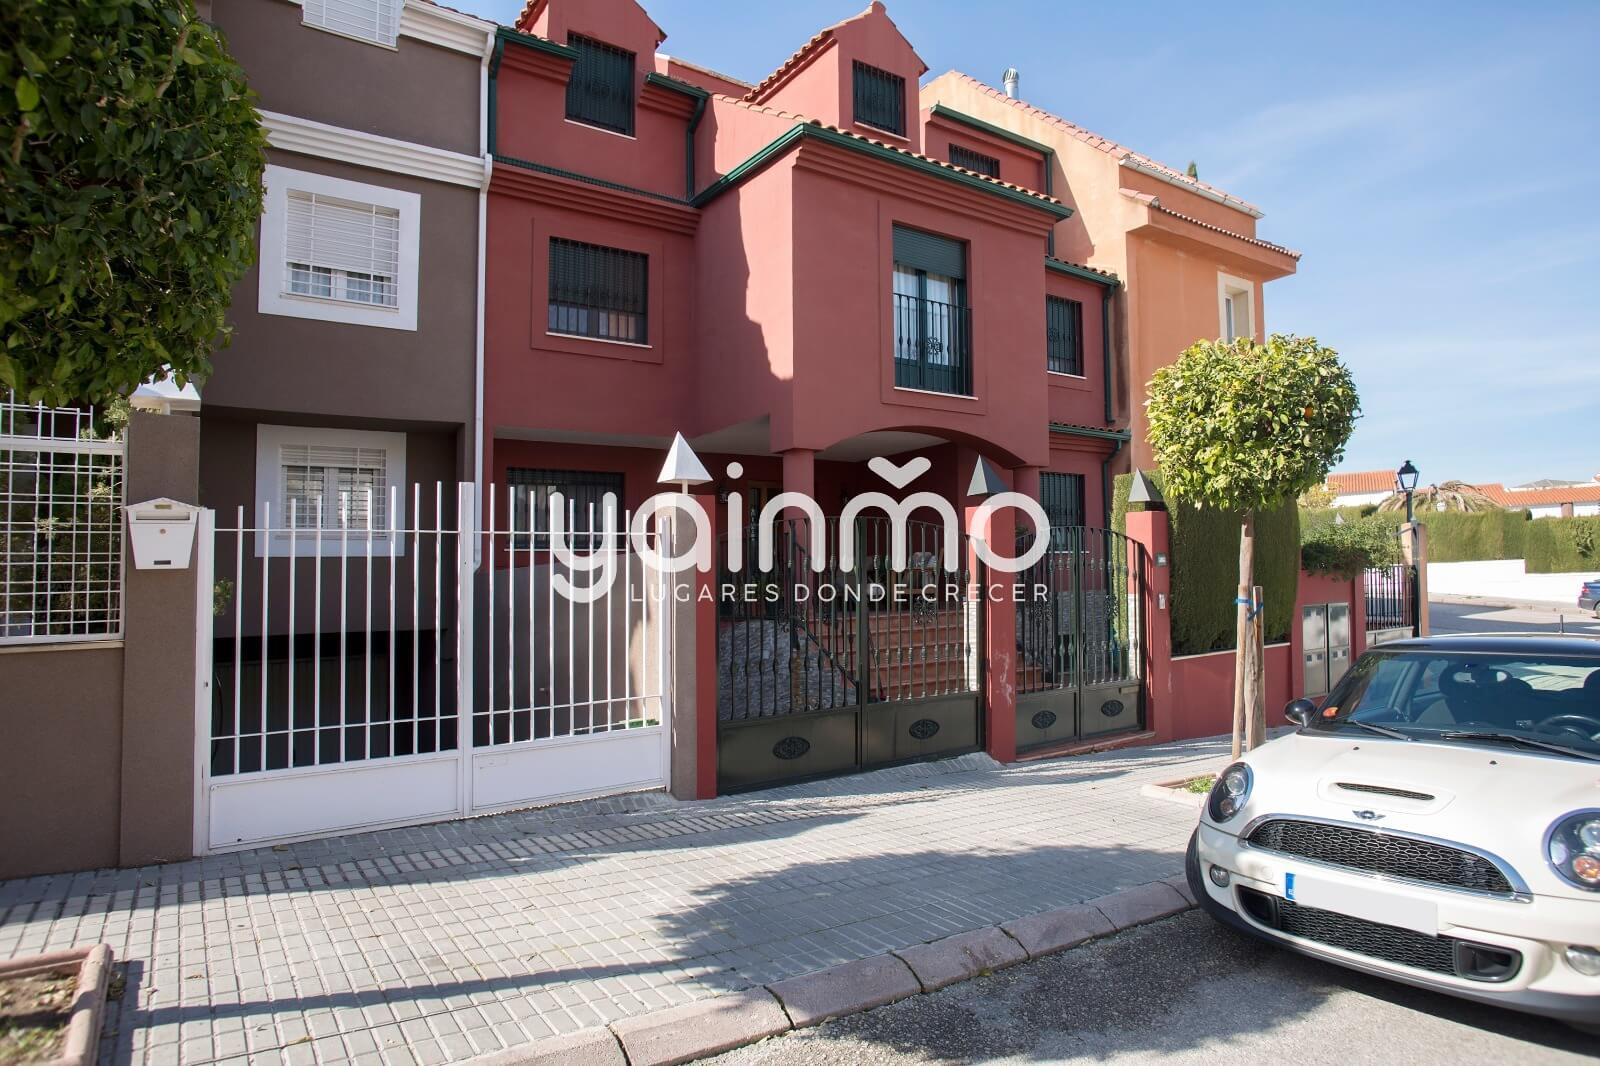 Venta Casa | Urb. Azahar | Jaén